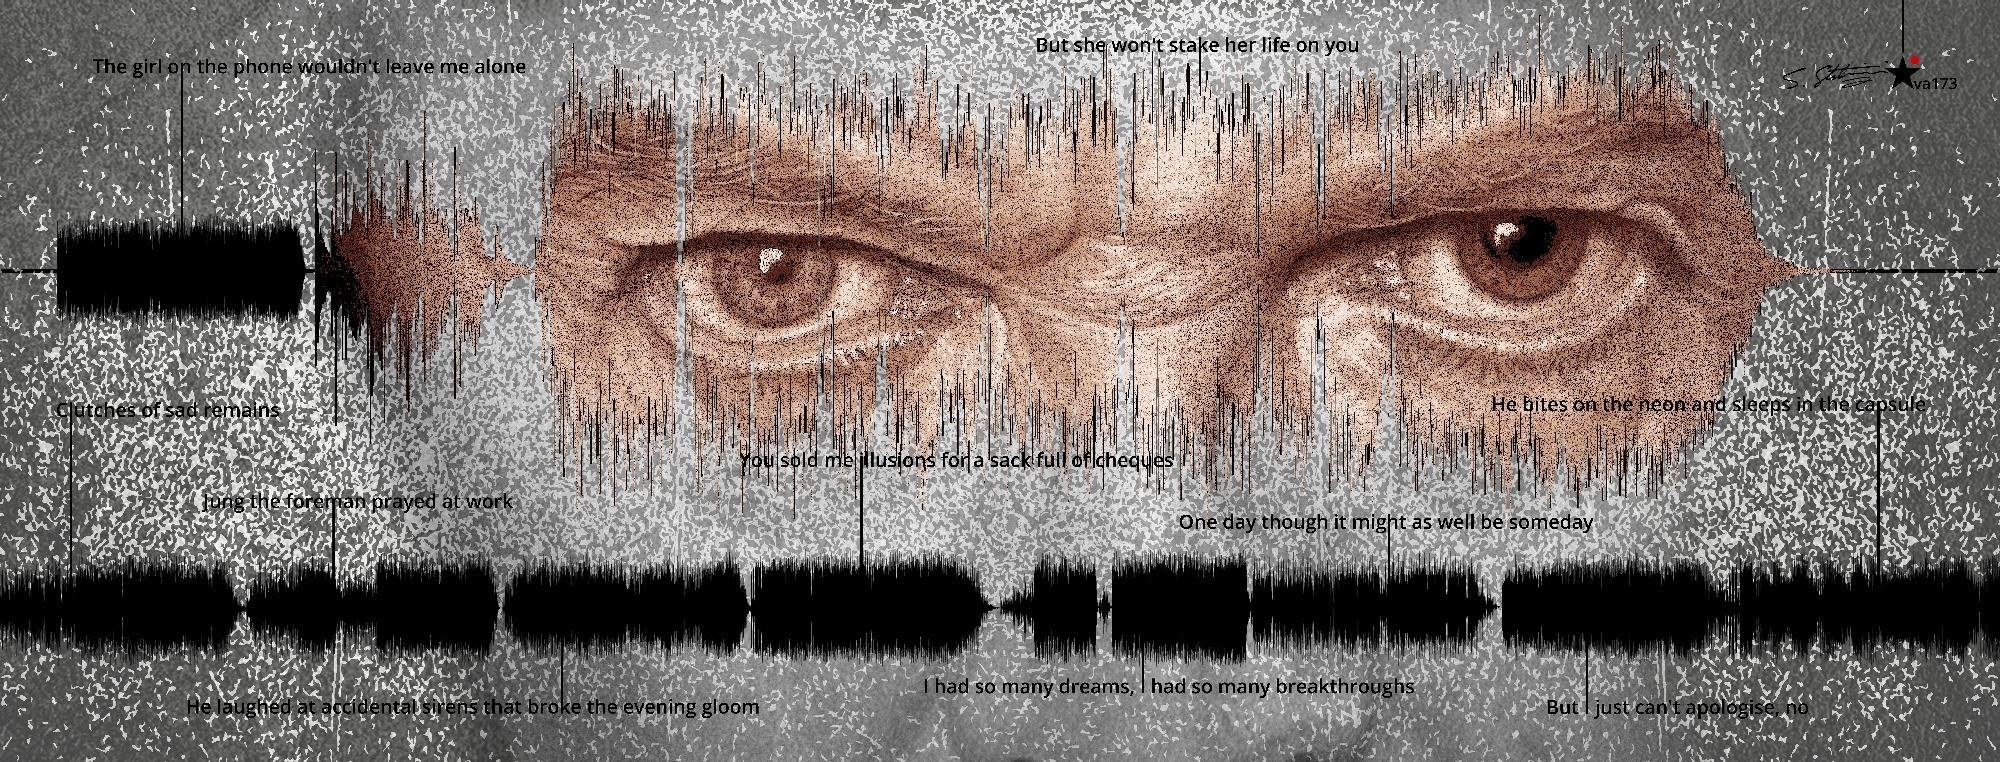 David Bowie Art Creation by Steve Stachini at the blackstar.STUDIO